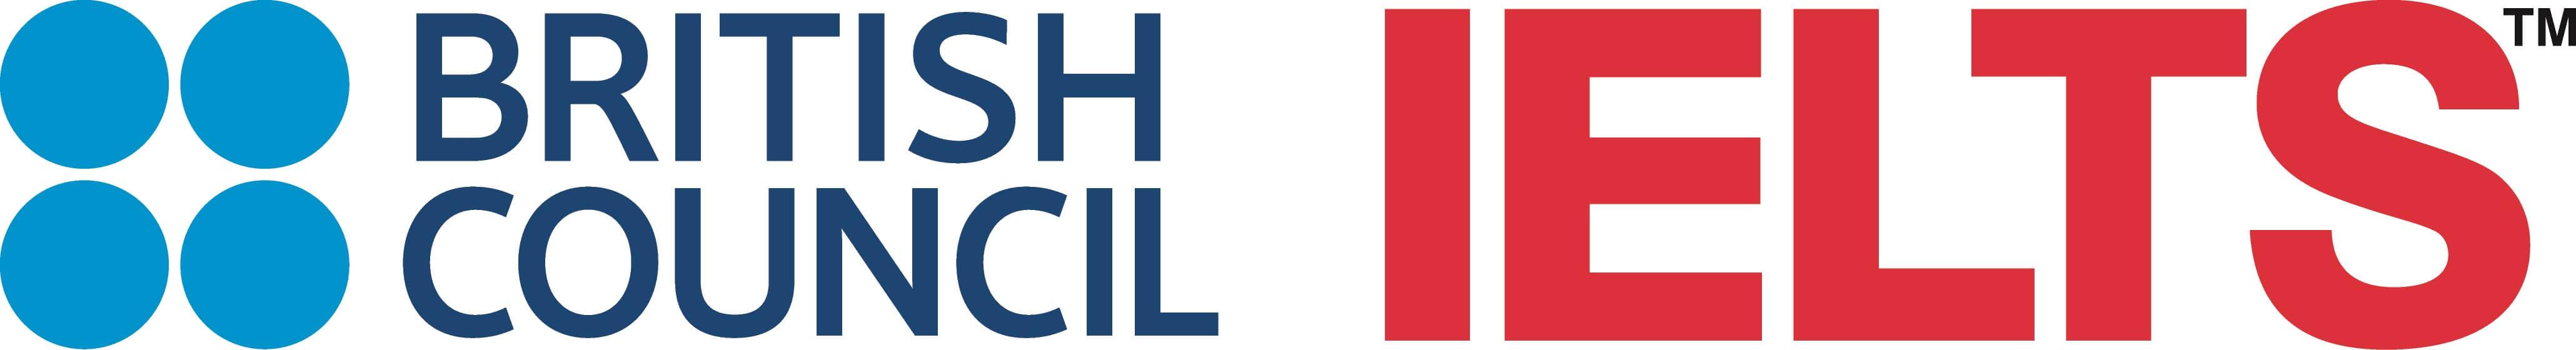 british council ielts msm academy logo